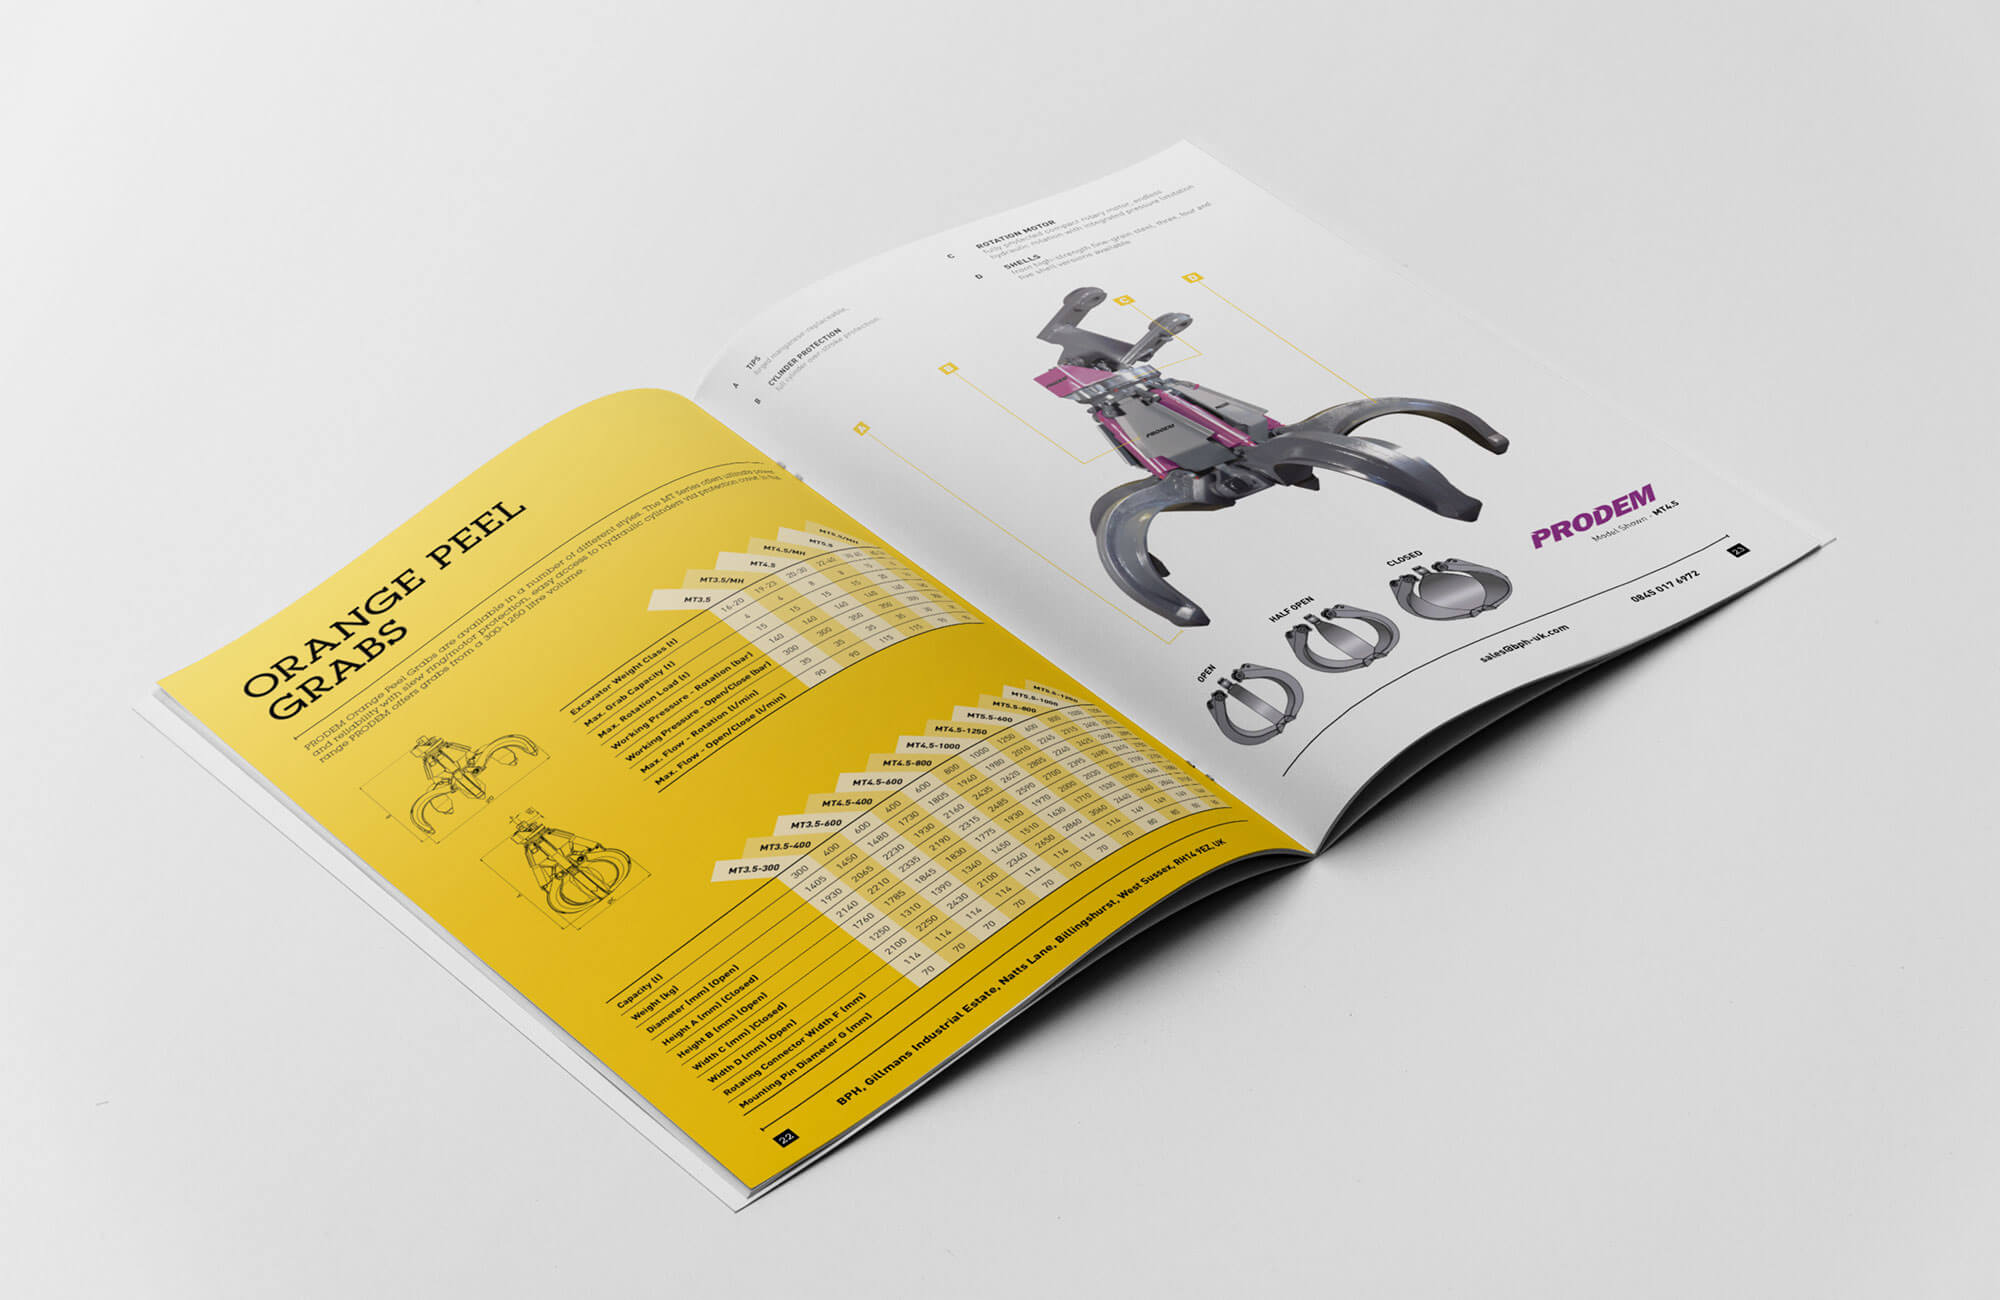 BPH Brochure Inside Spread Design Concept